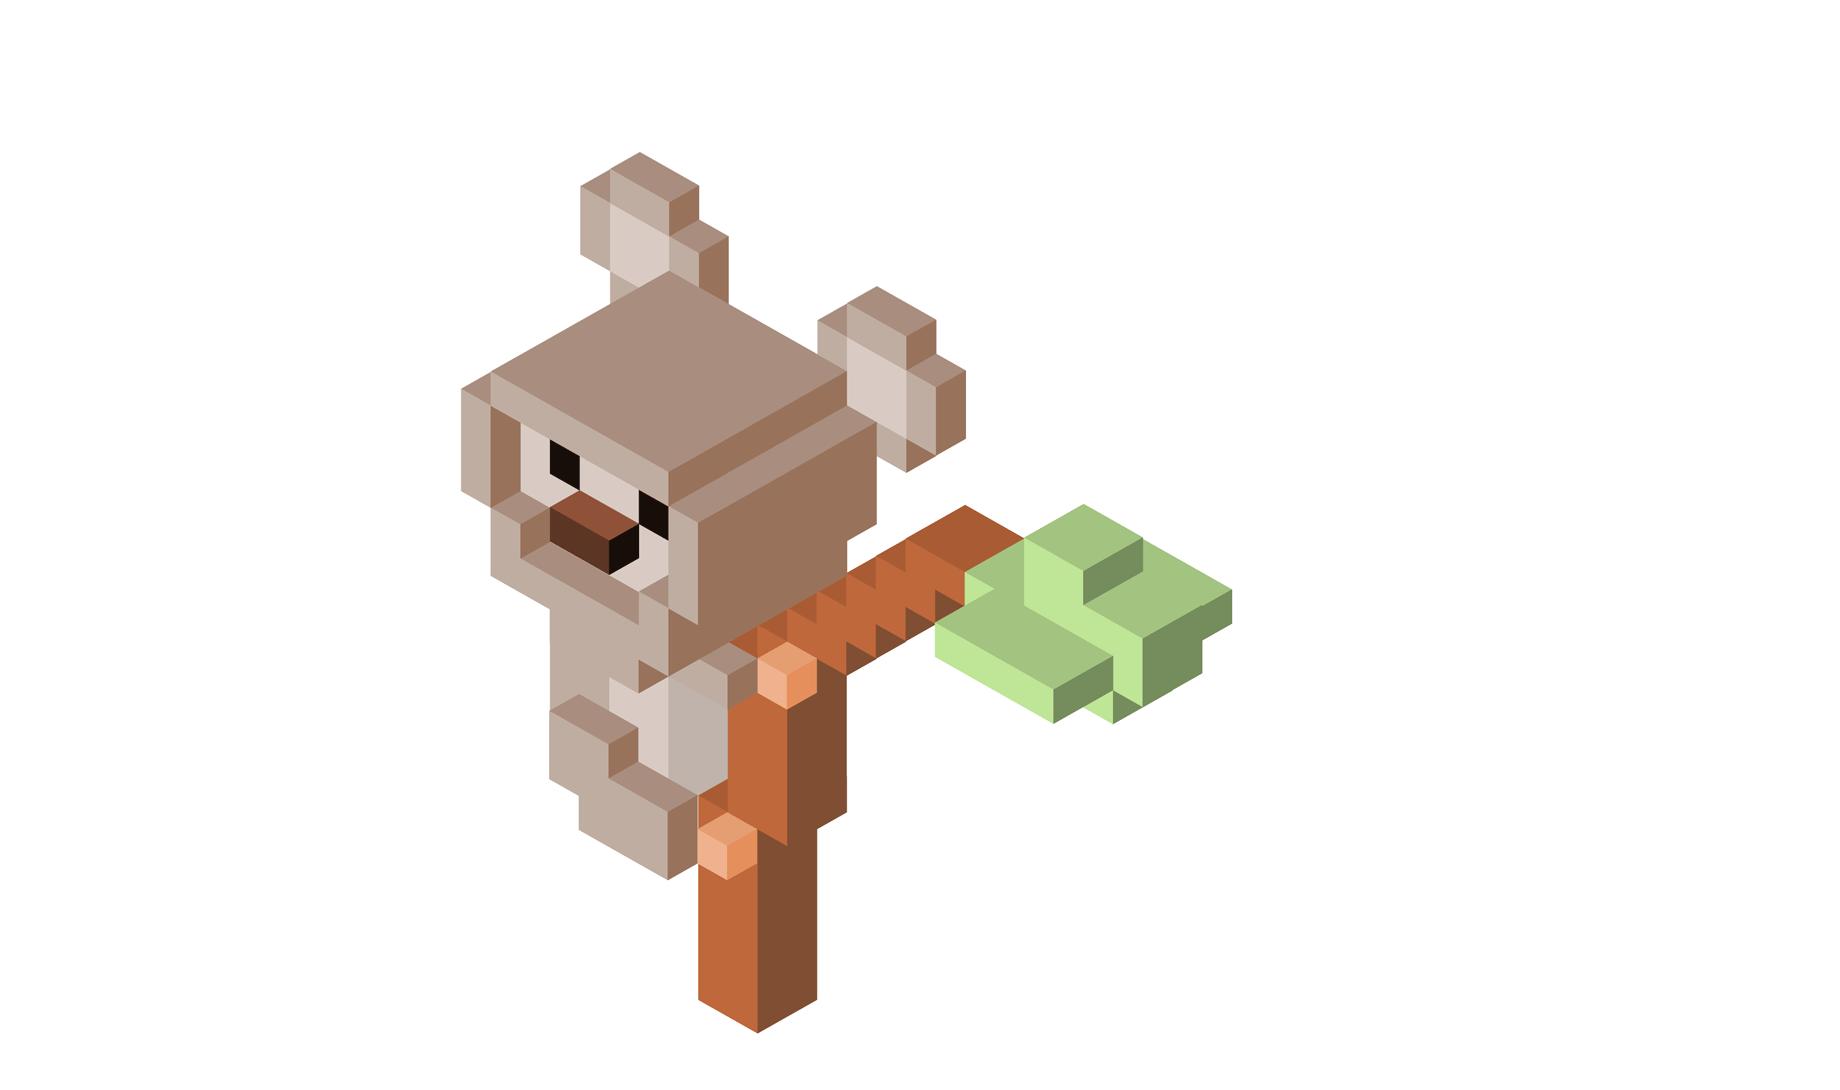 DESIGN_blocky_koala.pdf